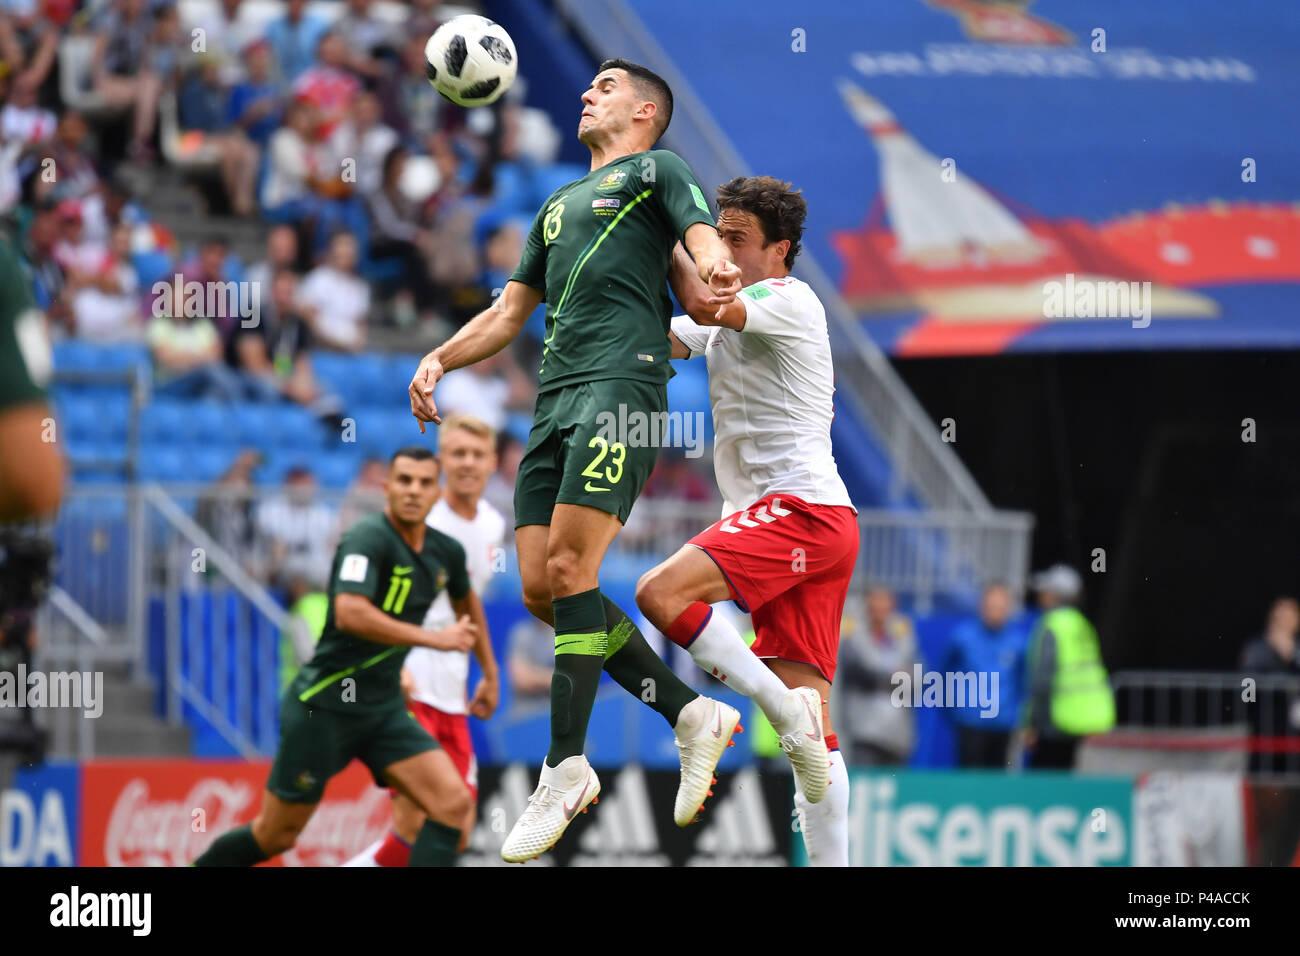 Samara, Russland. 21st June, 2018. Tom ROGIC (AUS), Action, duels versus Thomas DELANEY (DEN), Header. Denmark (DEN) - Australia (AUS) 1-1, Preliminary Round, Group C, Match 22, on 21.06.2018 in Samara, Samara Arena. Football World Cup 2018 in Russia from 14.06. - 15.07.2018. | usage worldwide Credit: dpa/Alamy Live News - Stock Image